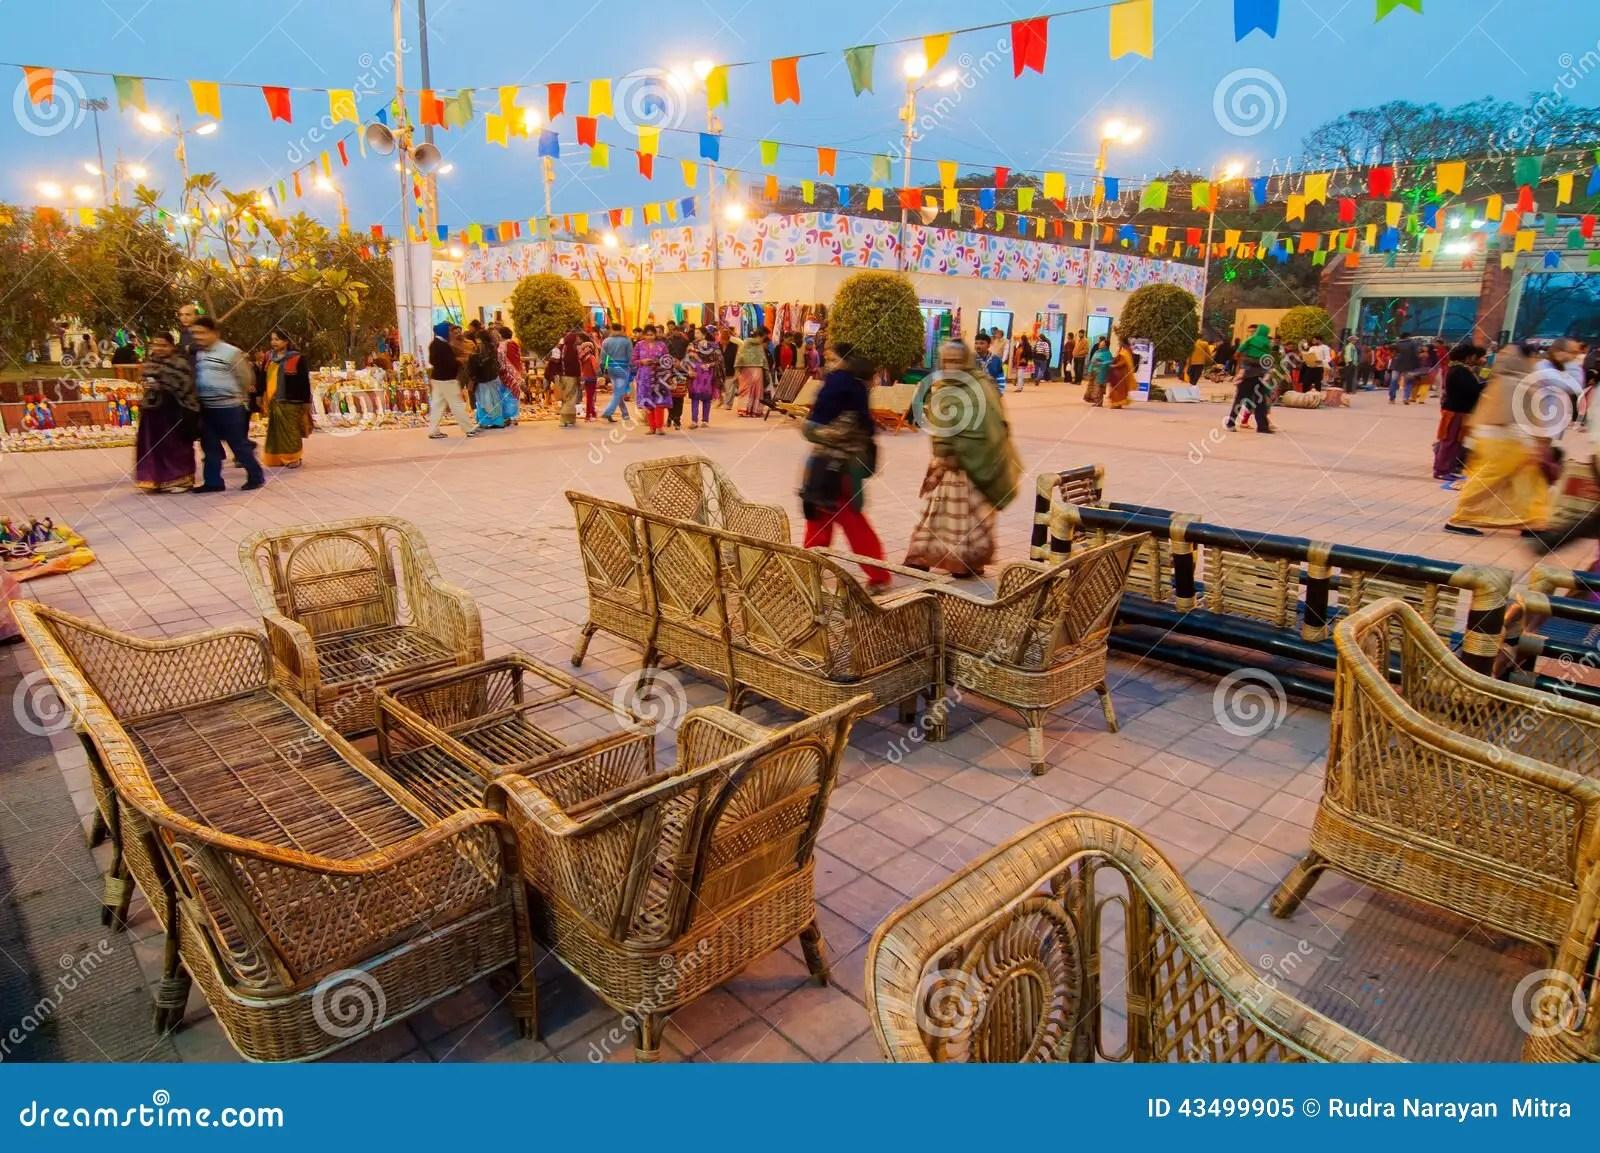 cost of sofa set in kolkata recliner chinese sets art work indian handicrafts fair at